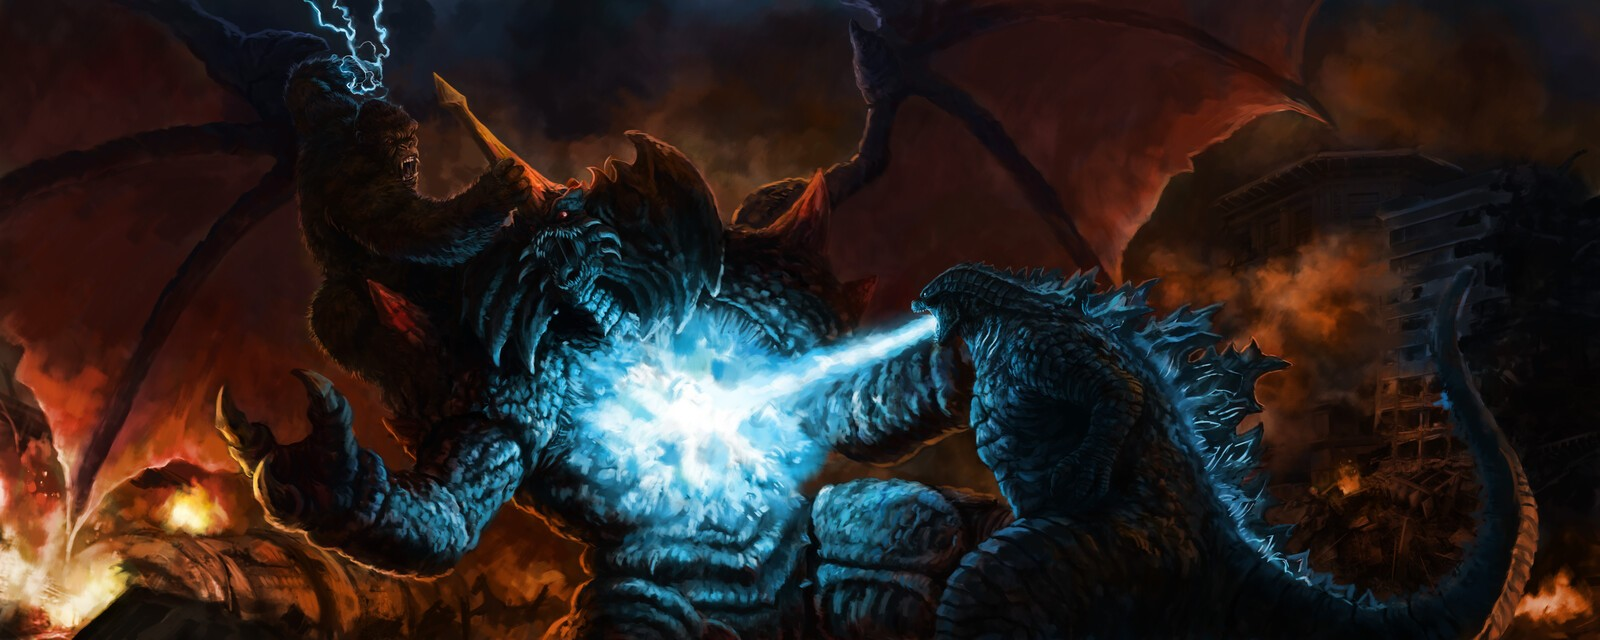 Godzilla Vs Destroyah 12